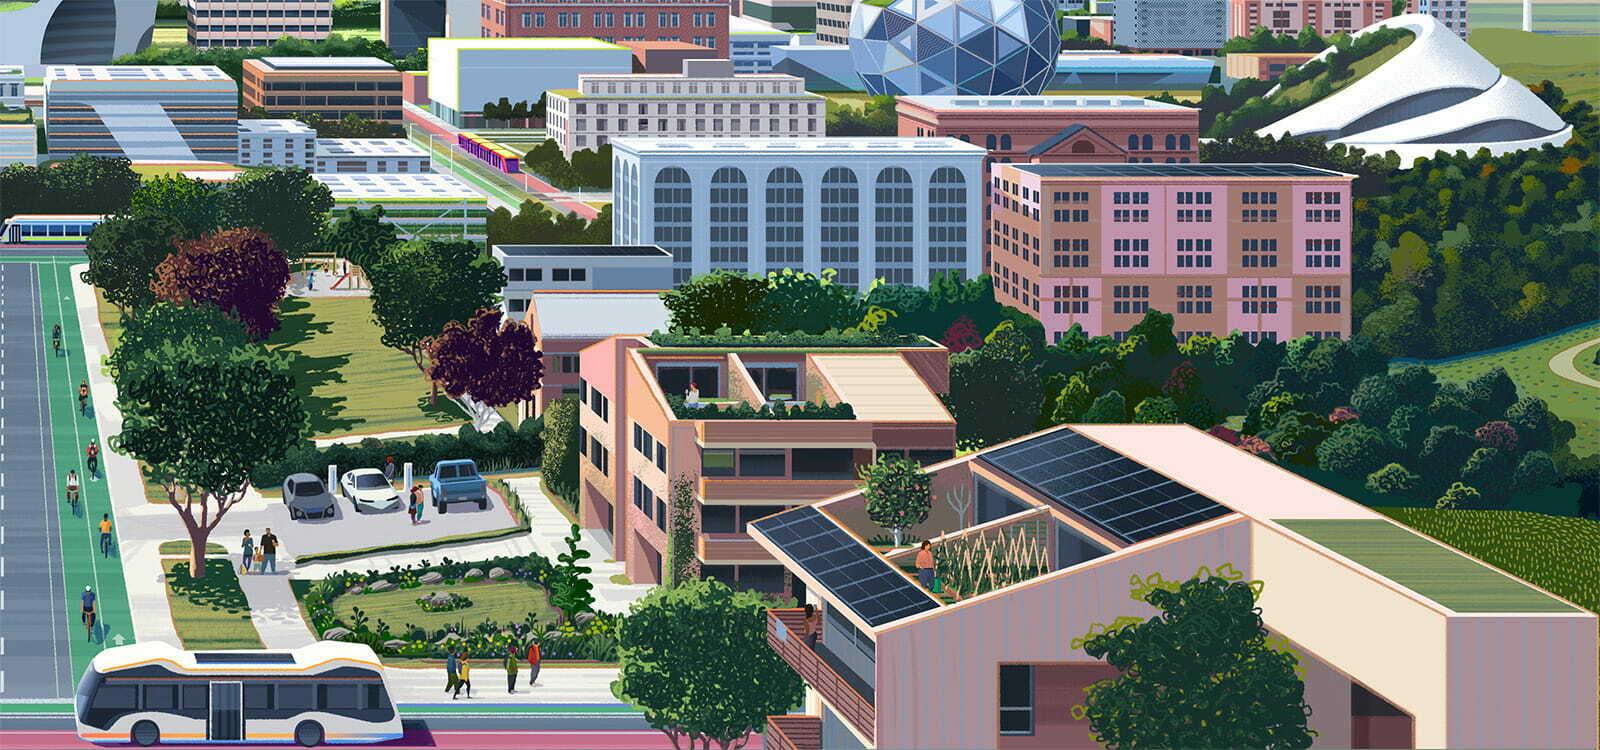 NRDC Colorado 2030